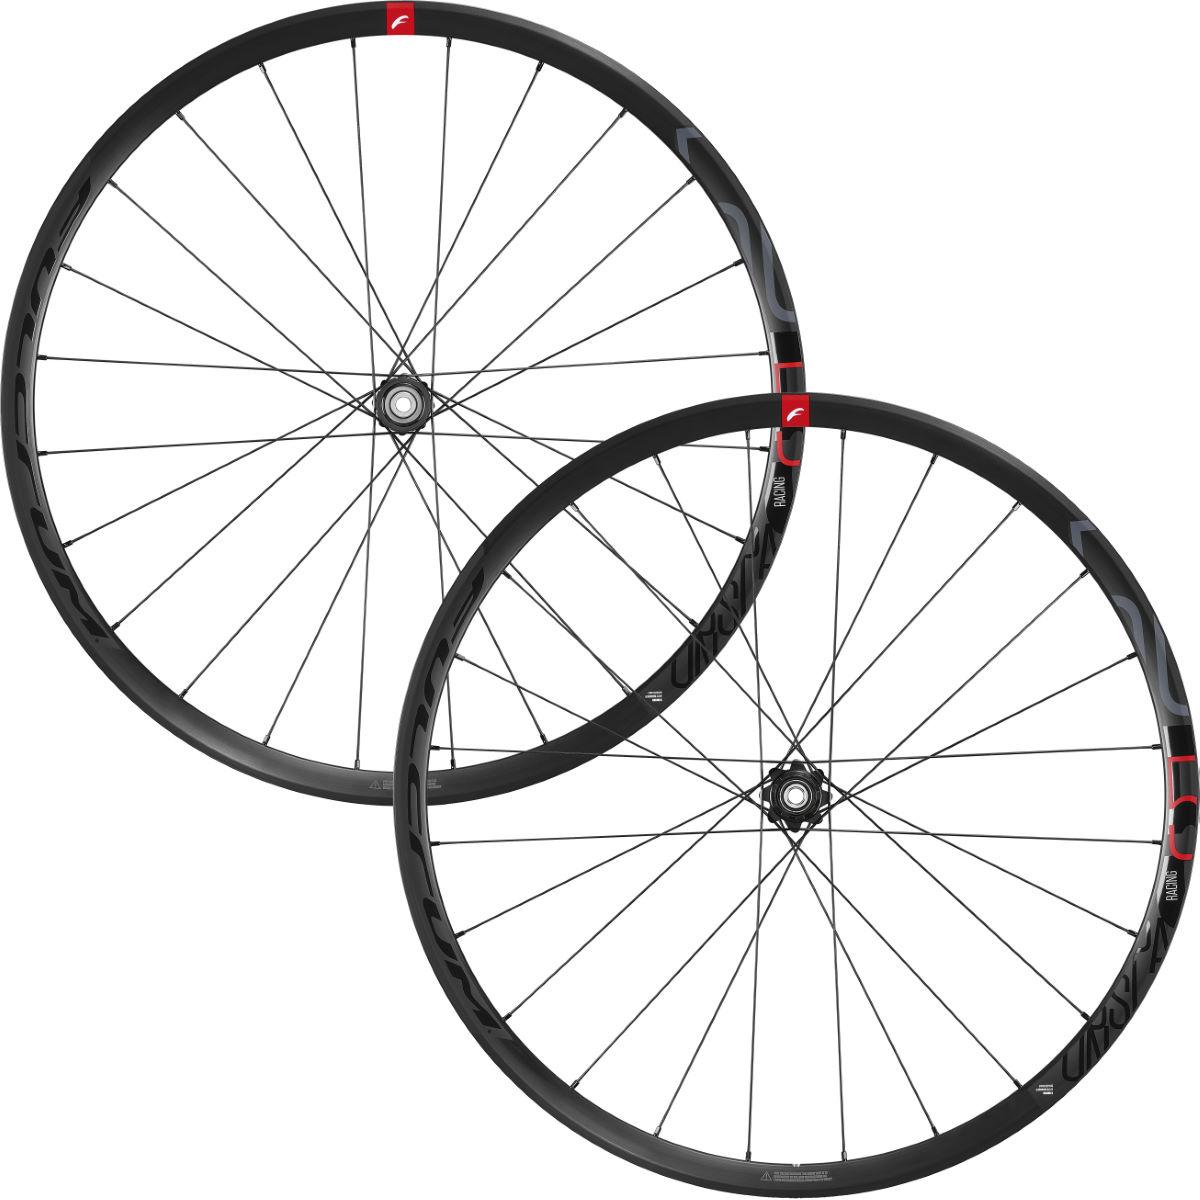 Fulcrum Racing 5 Disc Wheelset Performance Wheels